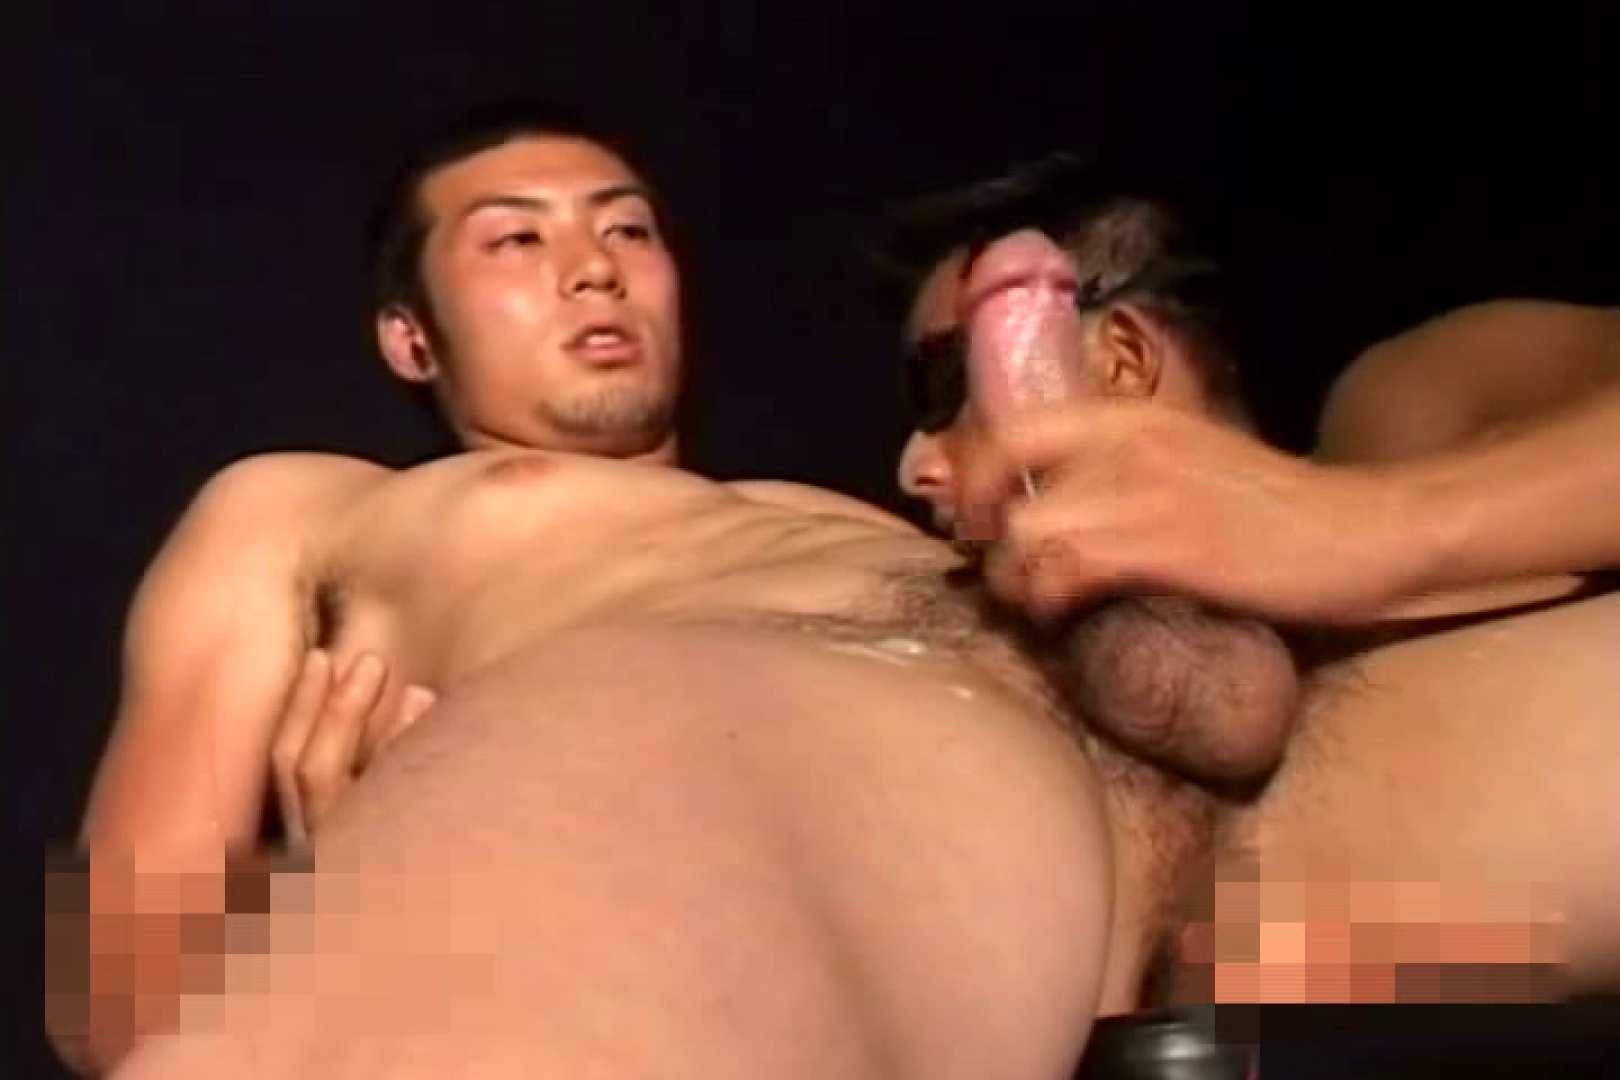 Beautiful muscle モッコリ野郎達!Vol.04 フェチ ゲイAV画像 49連発 6